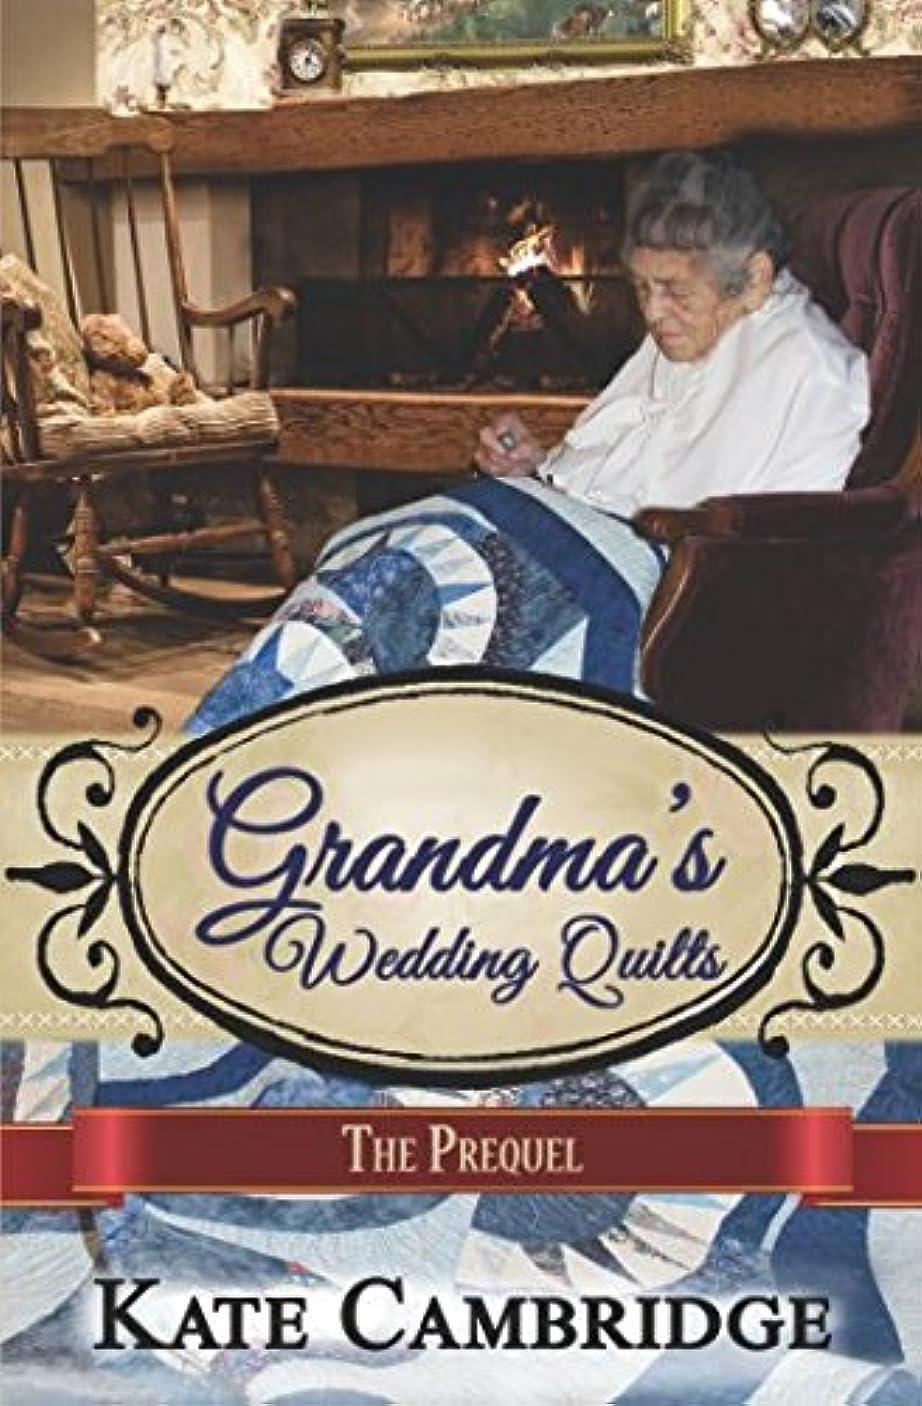 温度計楽観布Grandma's Wedding Quilts - THE PREQUEL